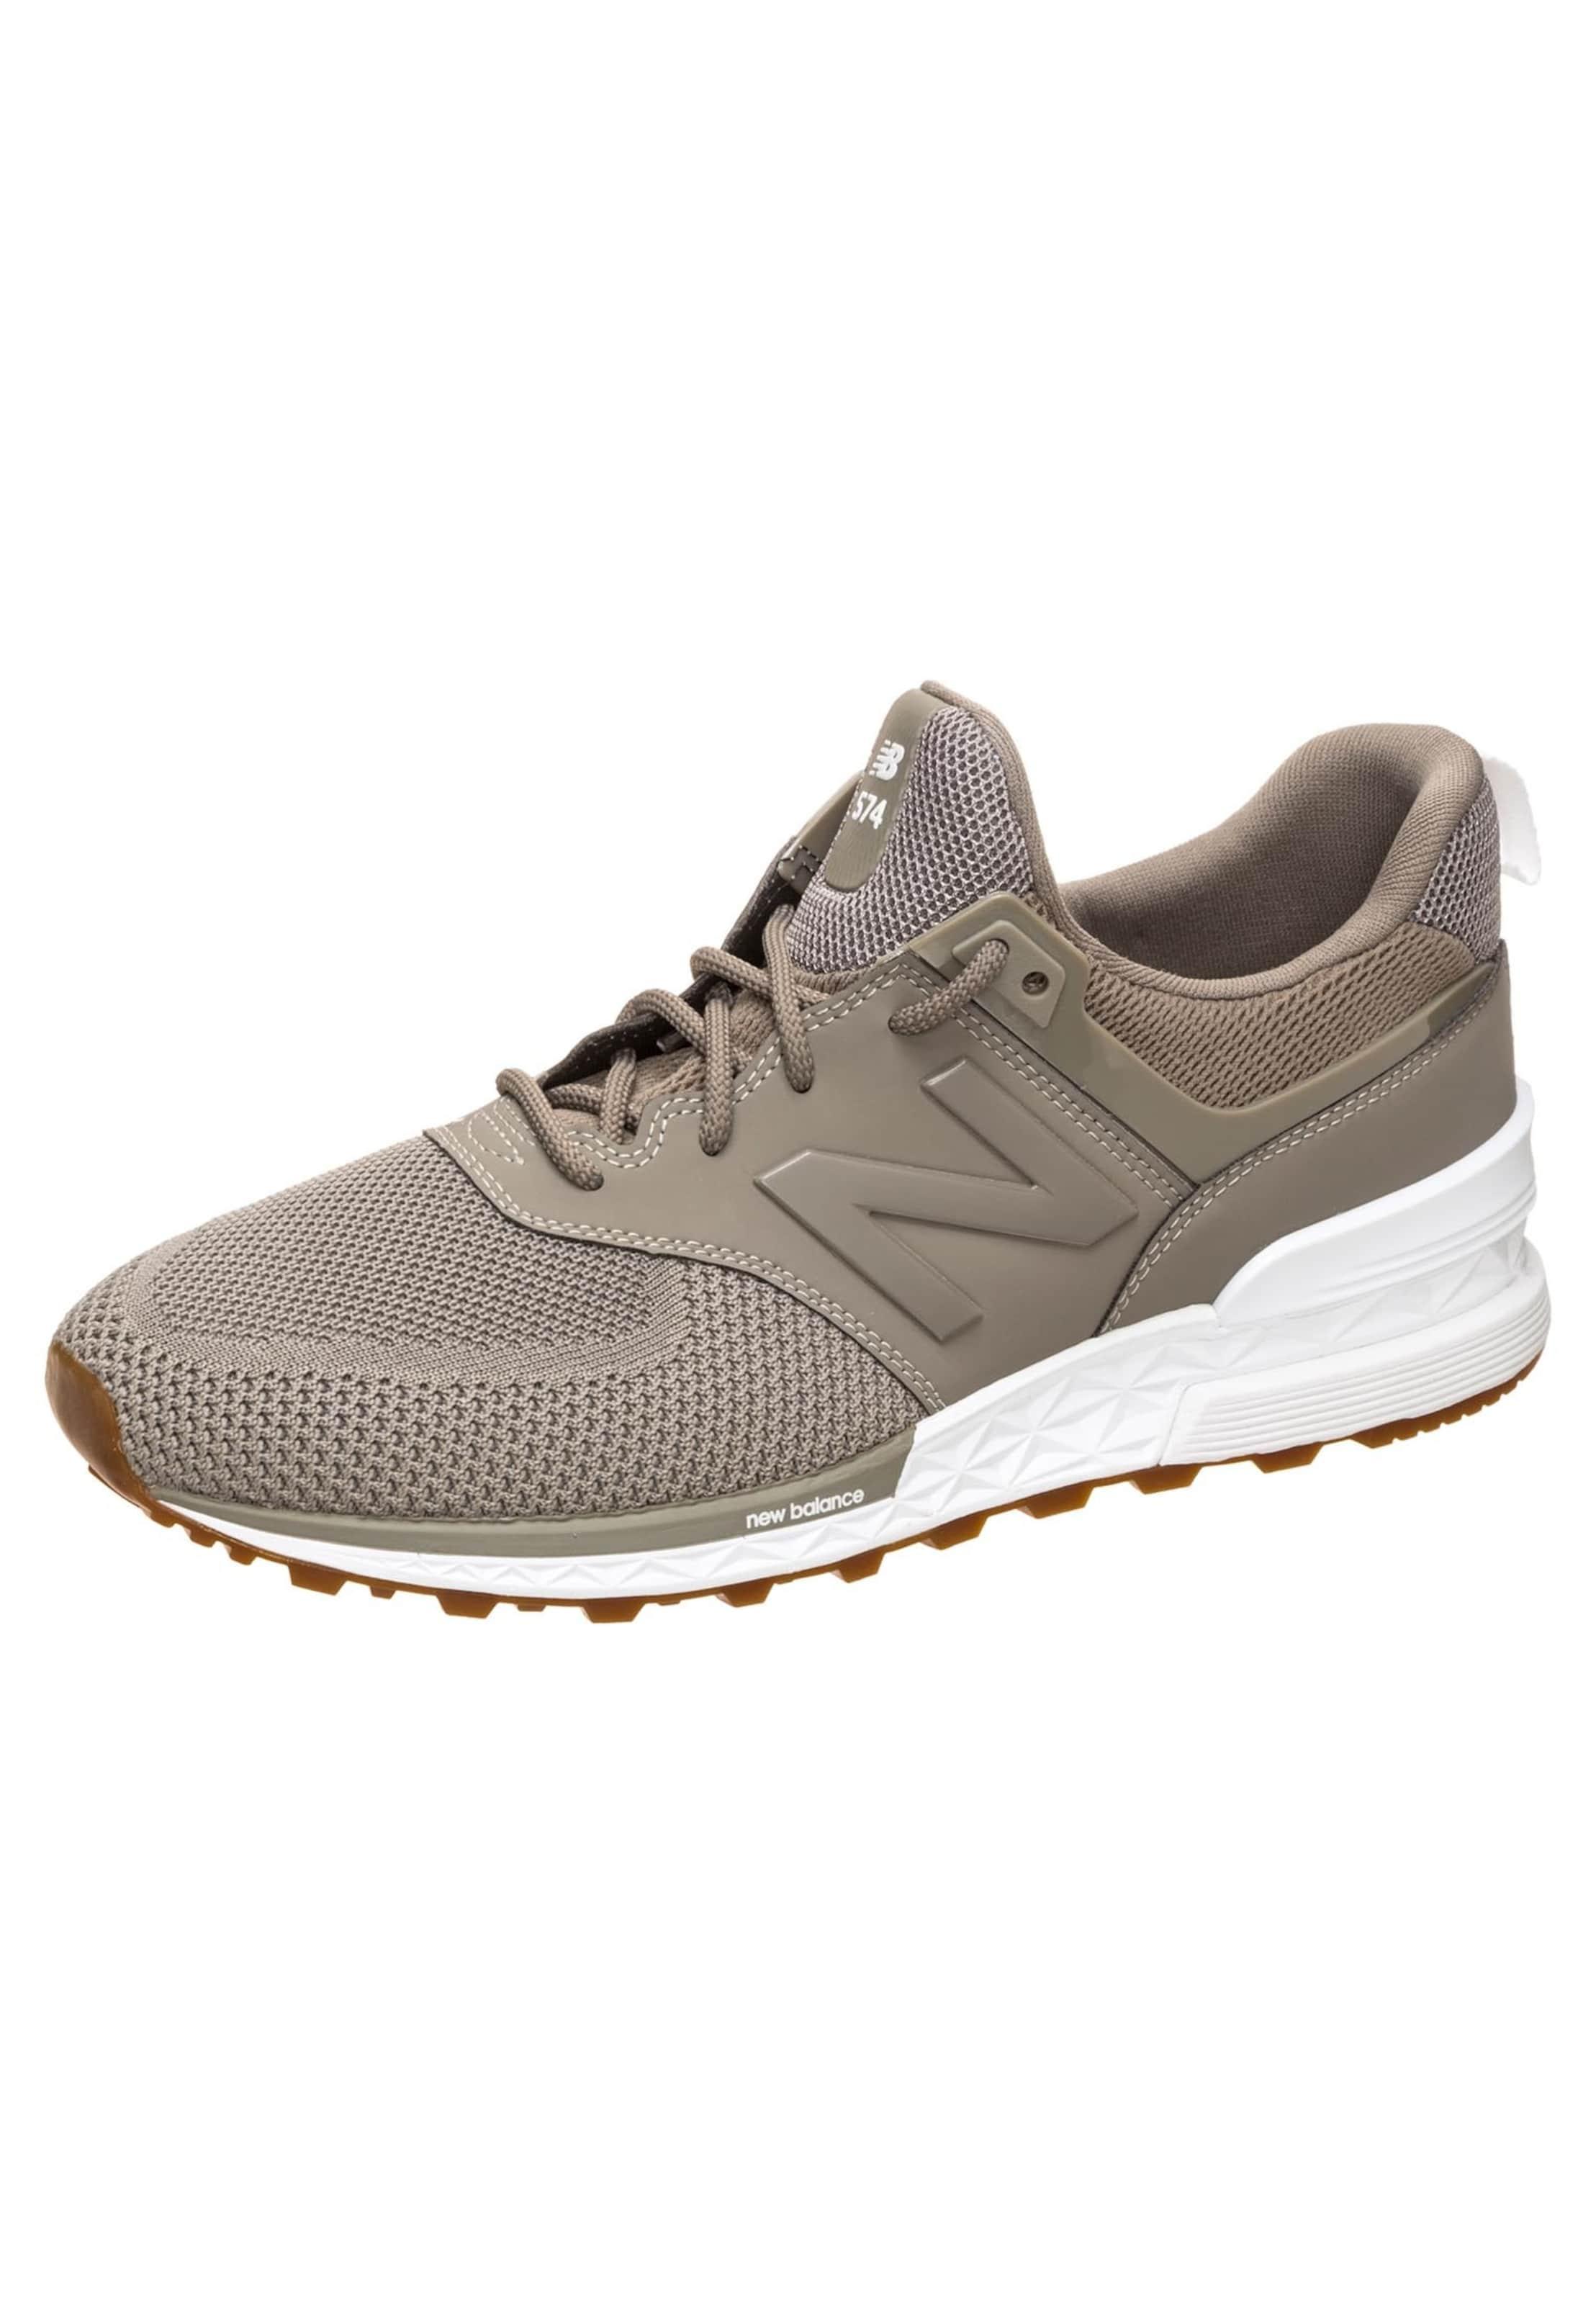 new new new balance Sneaker  MS574-EMG-D c55522